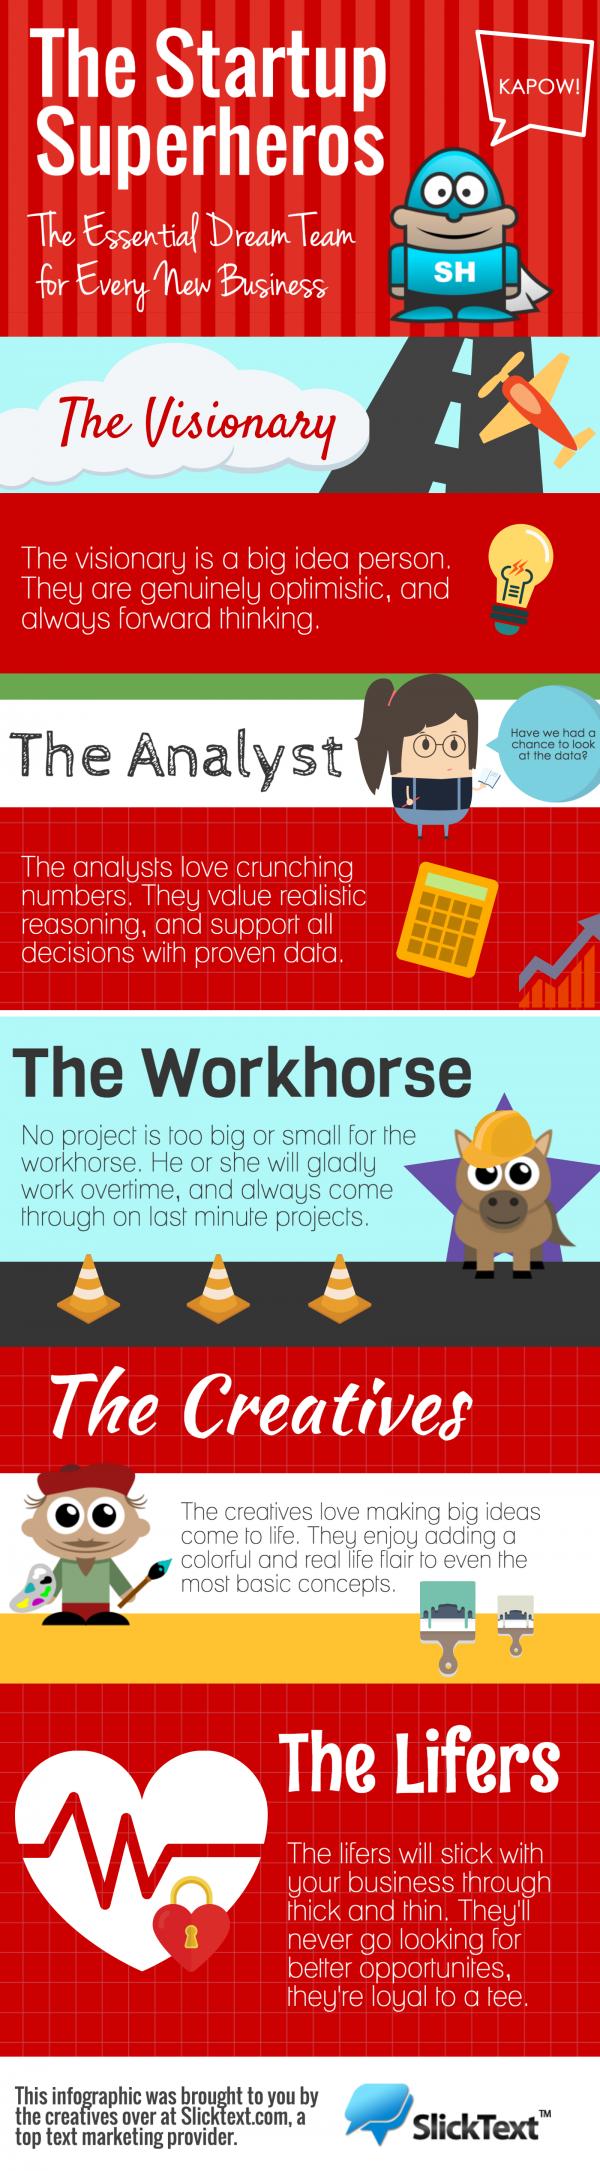 Startup superheros slicktext infographic